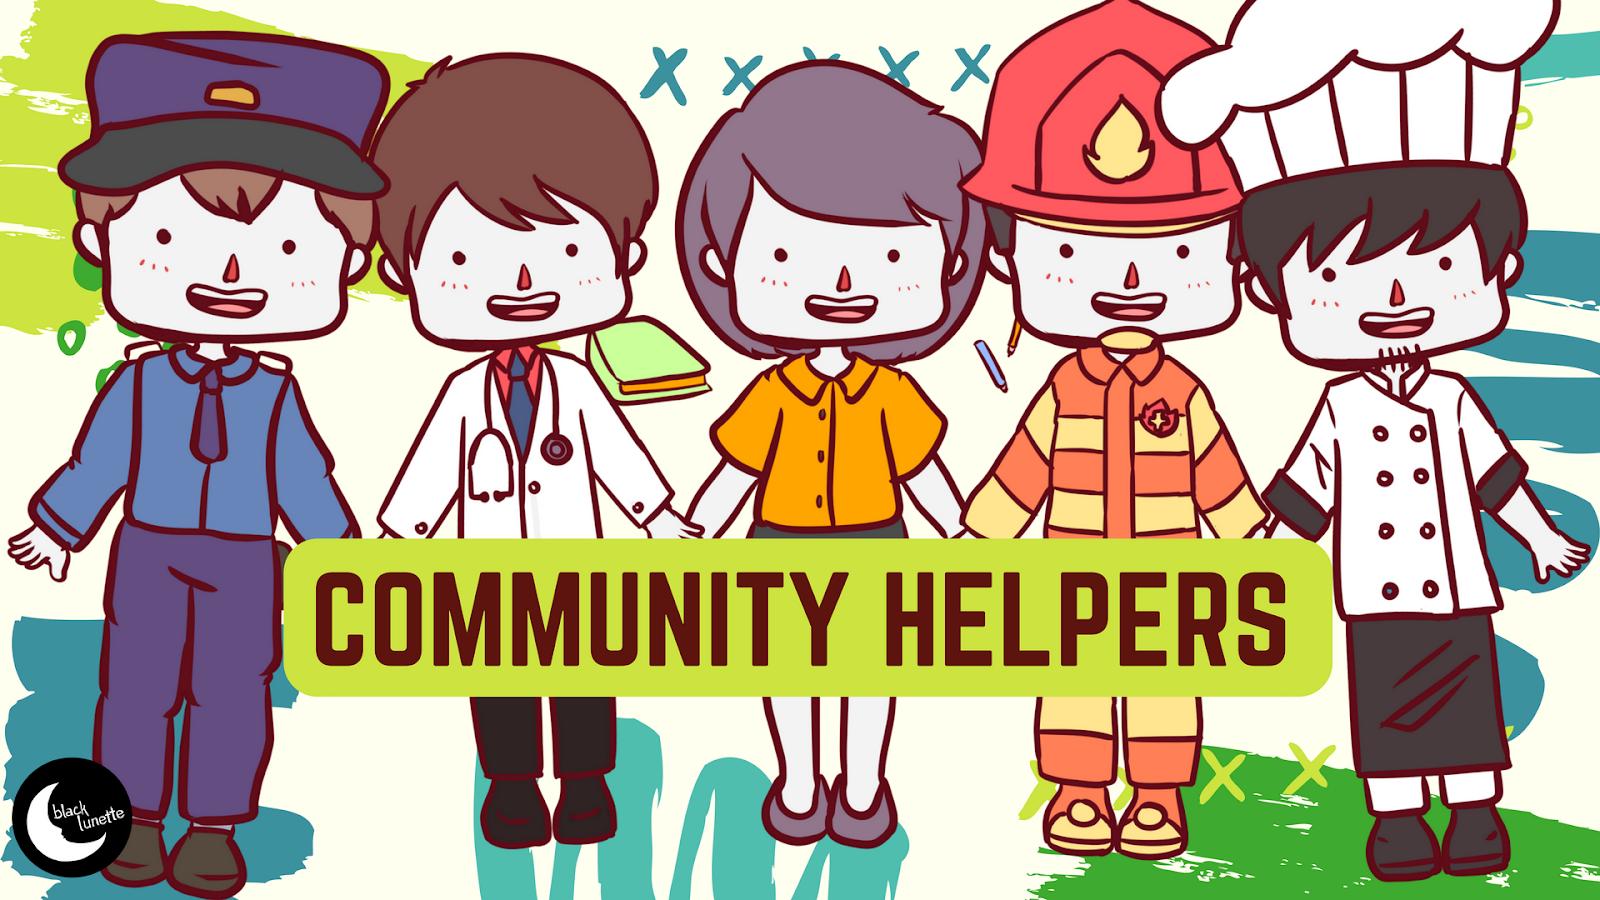 community helpers clipart free download [ 1600 x 900 Pixel ]